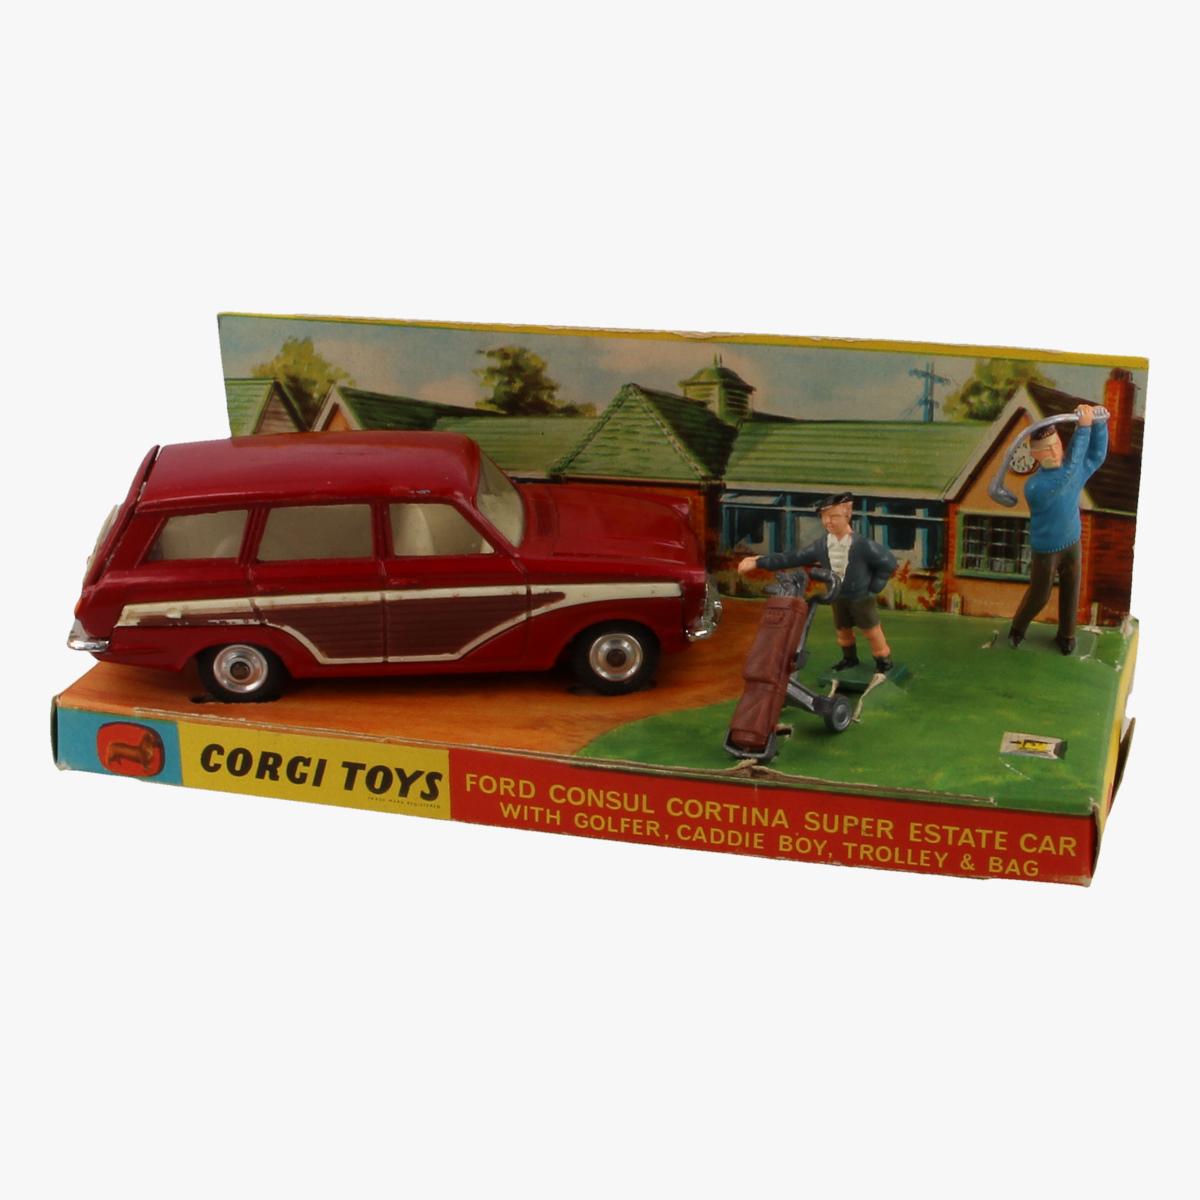 Afbeeldingen van Corgi Toys. Ford Consul Cortina Super Estate Car. Nr. 440